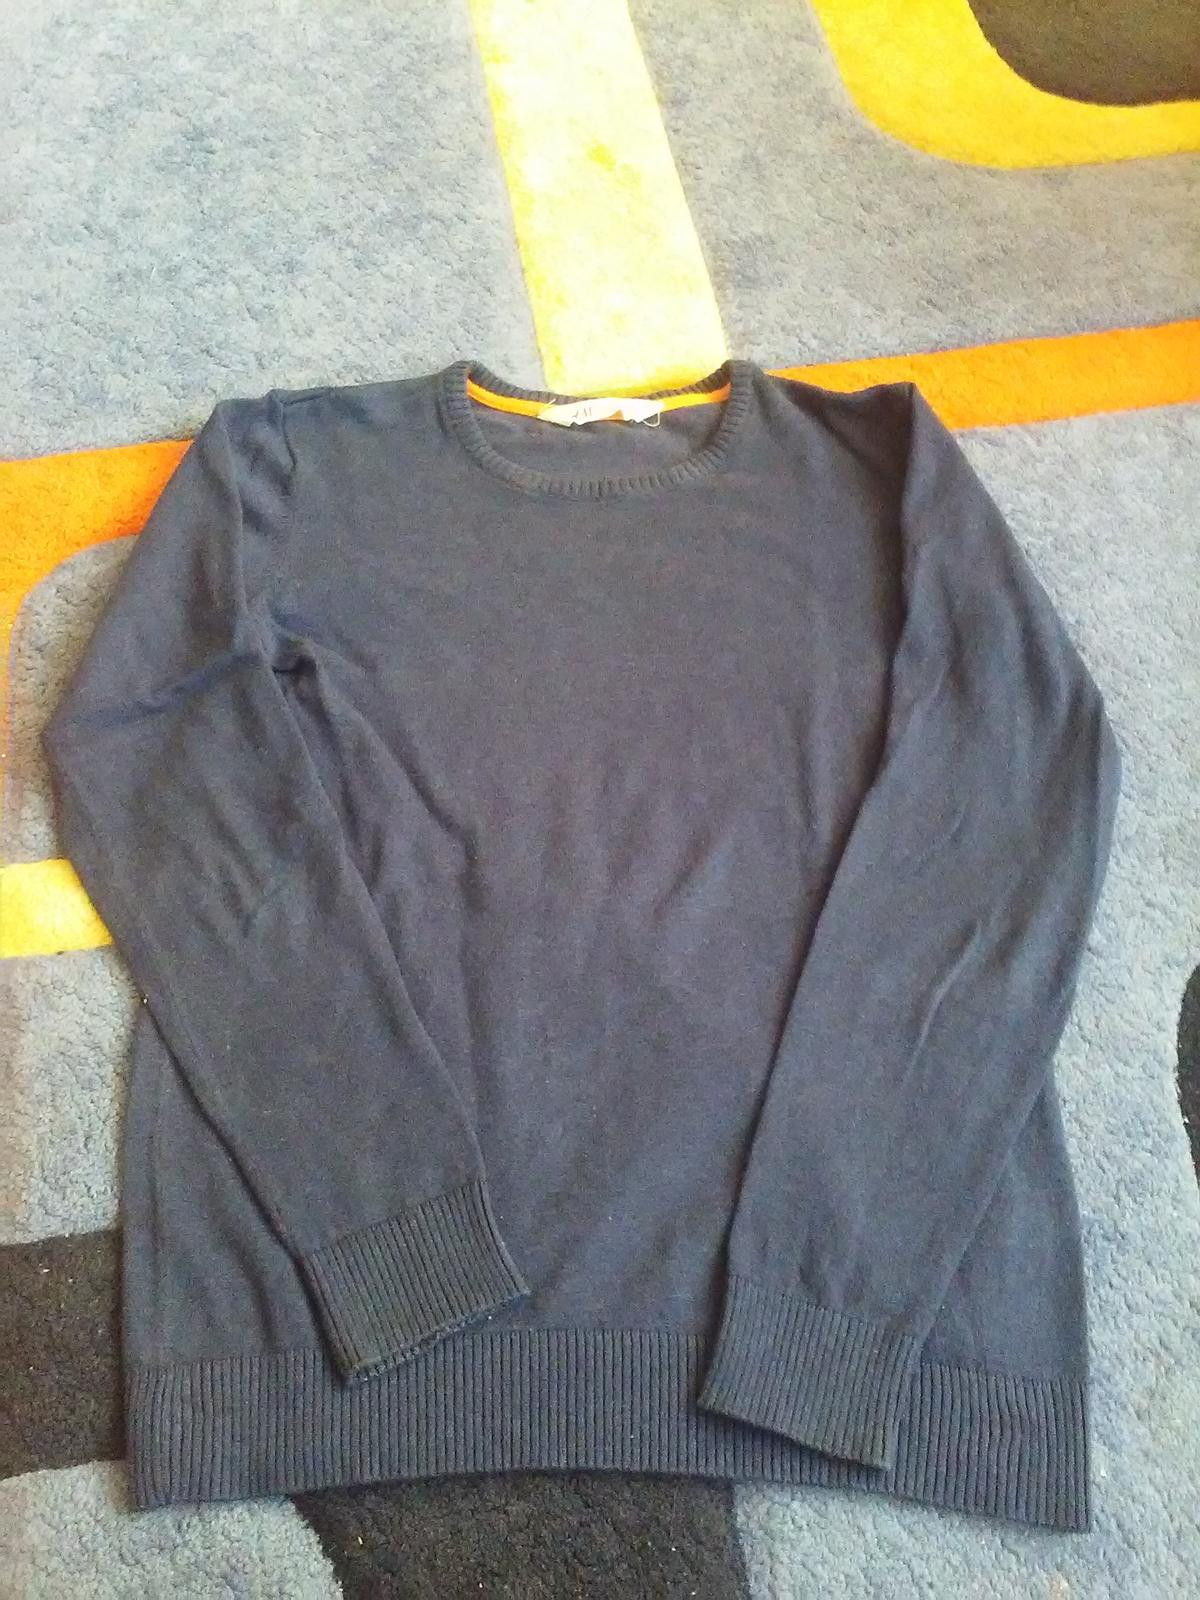 Tmavomodrý svetrík H&M - Obrázok č. 1